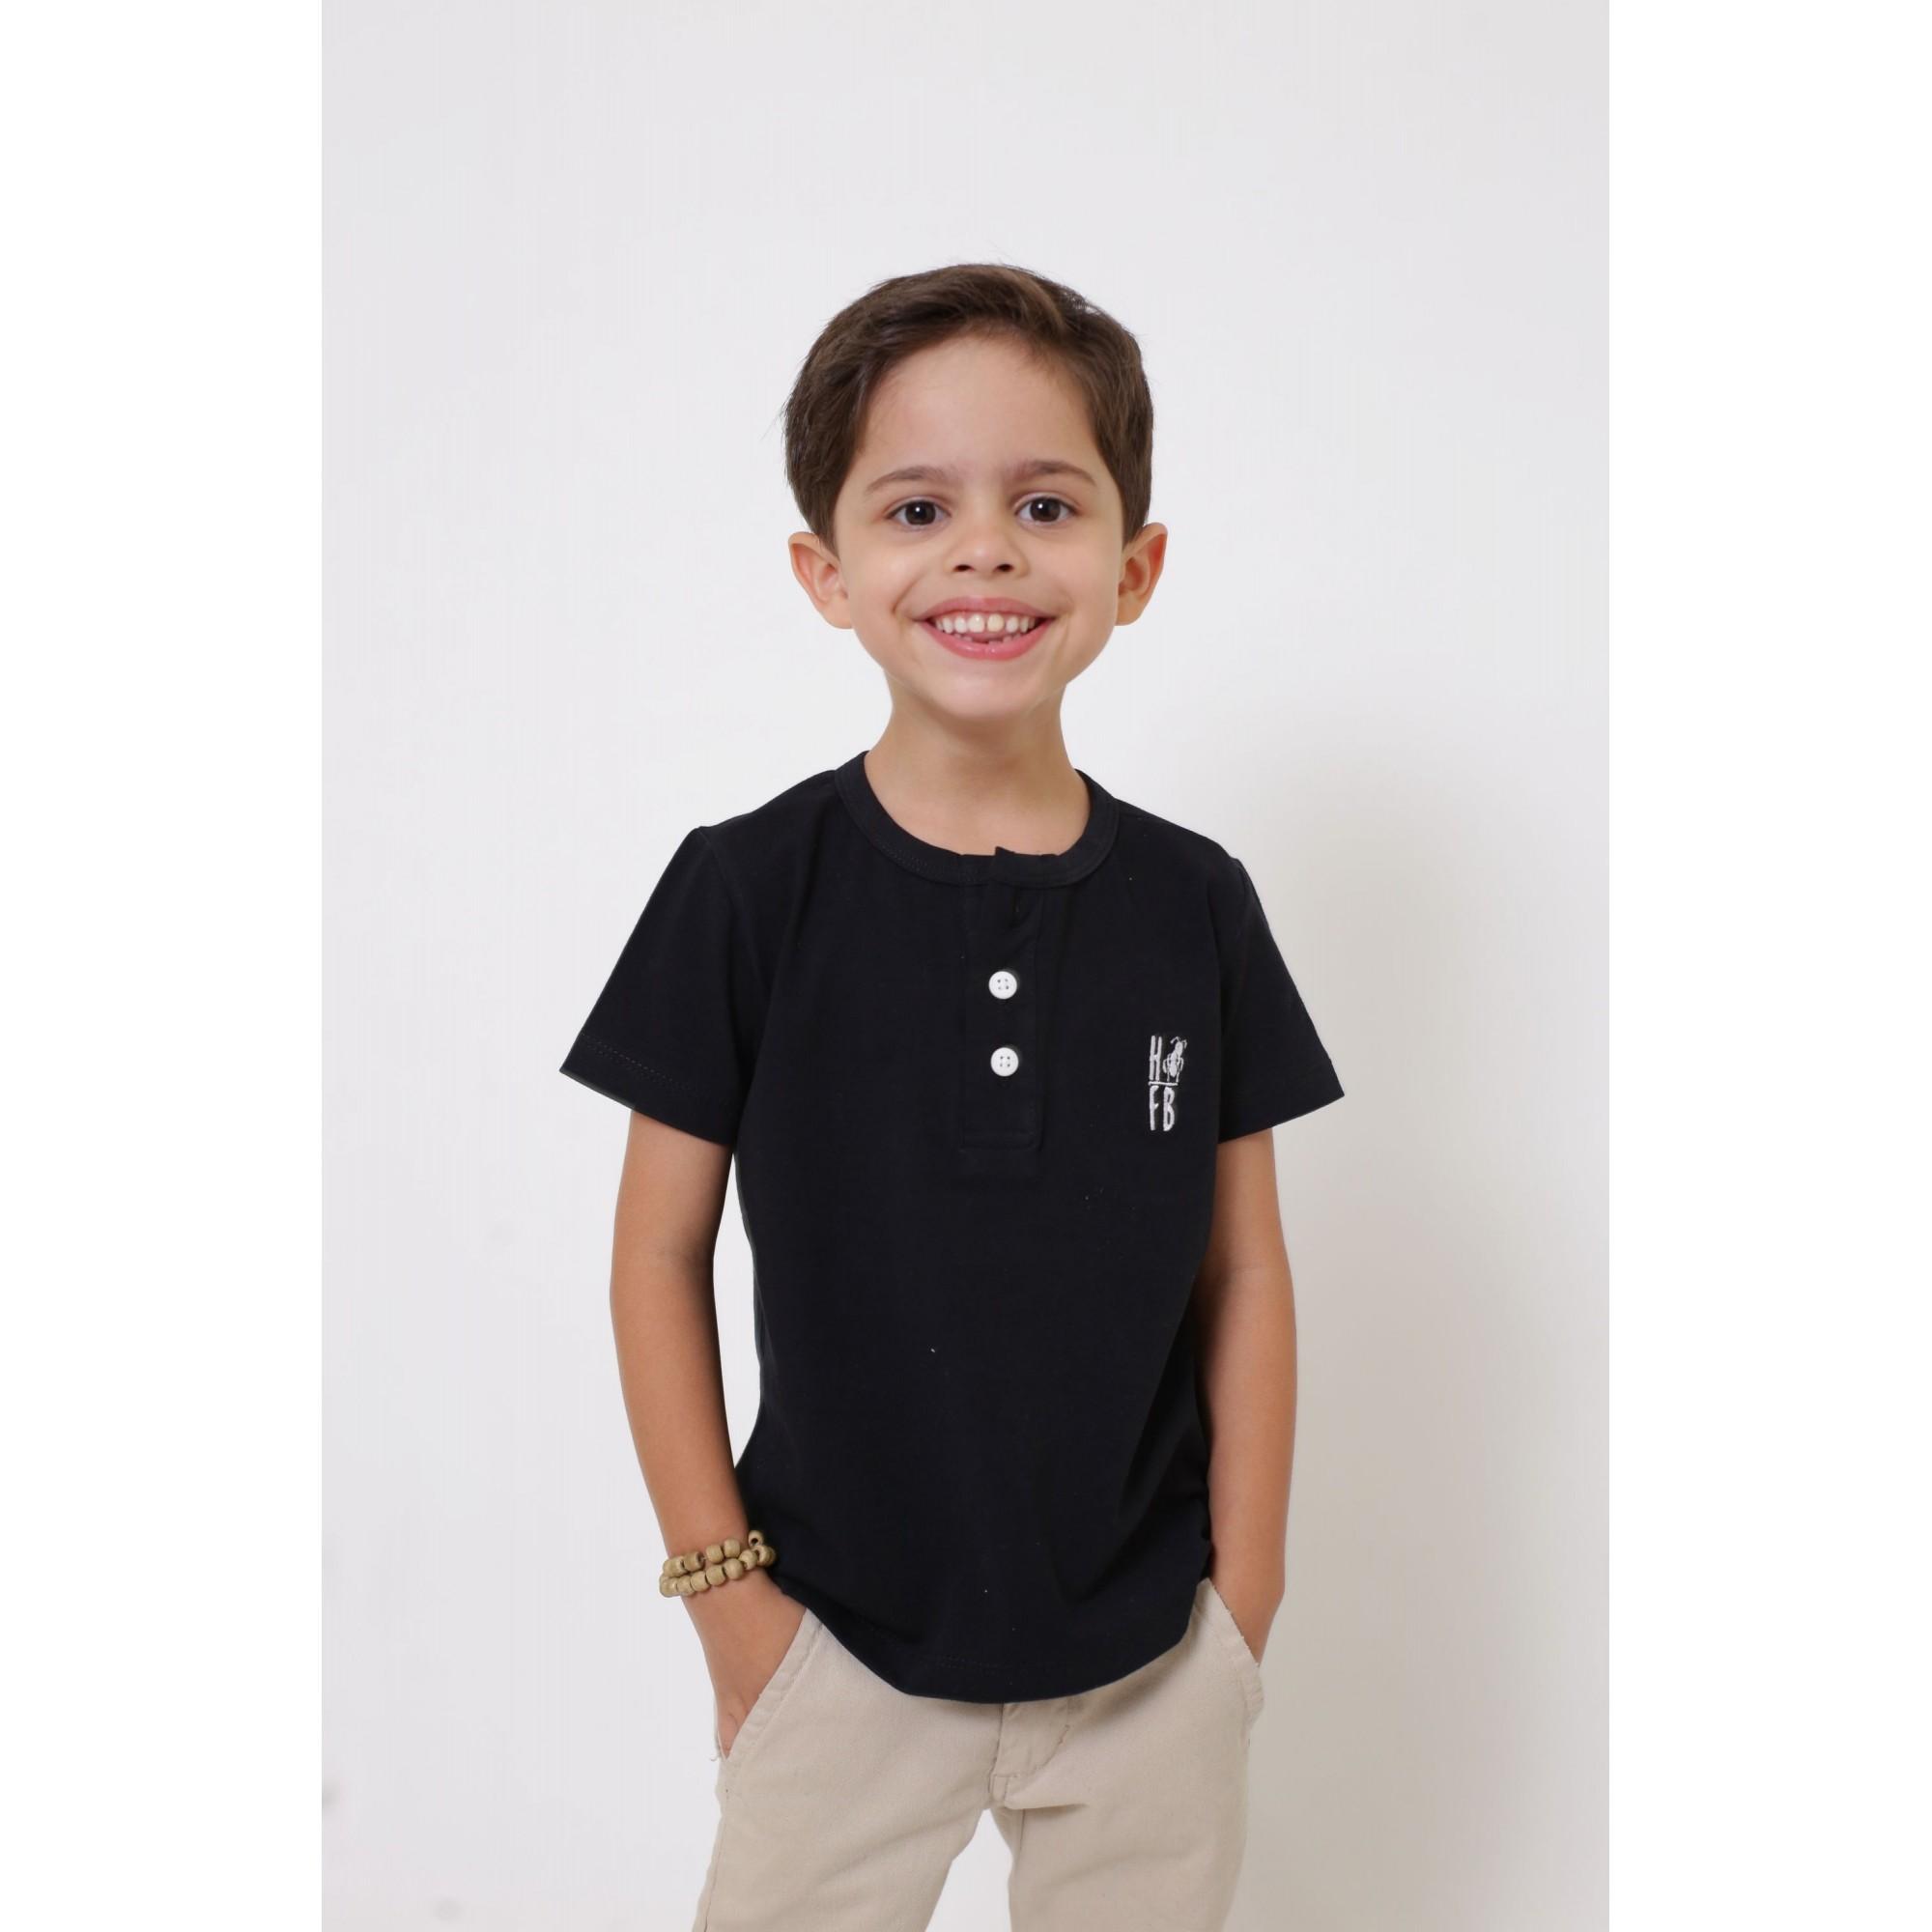 T-Shirt ou Body Unissex - Henley - Infantil - Preta  - Heitor Fashion Brazil